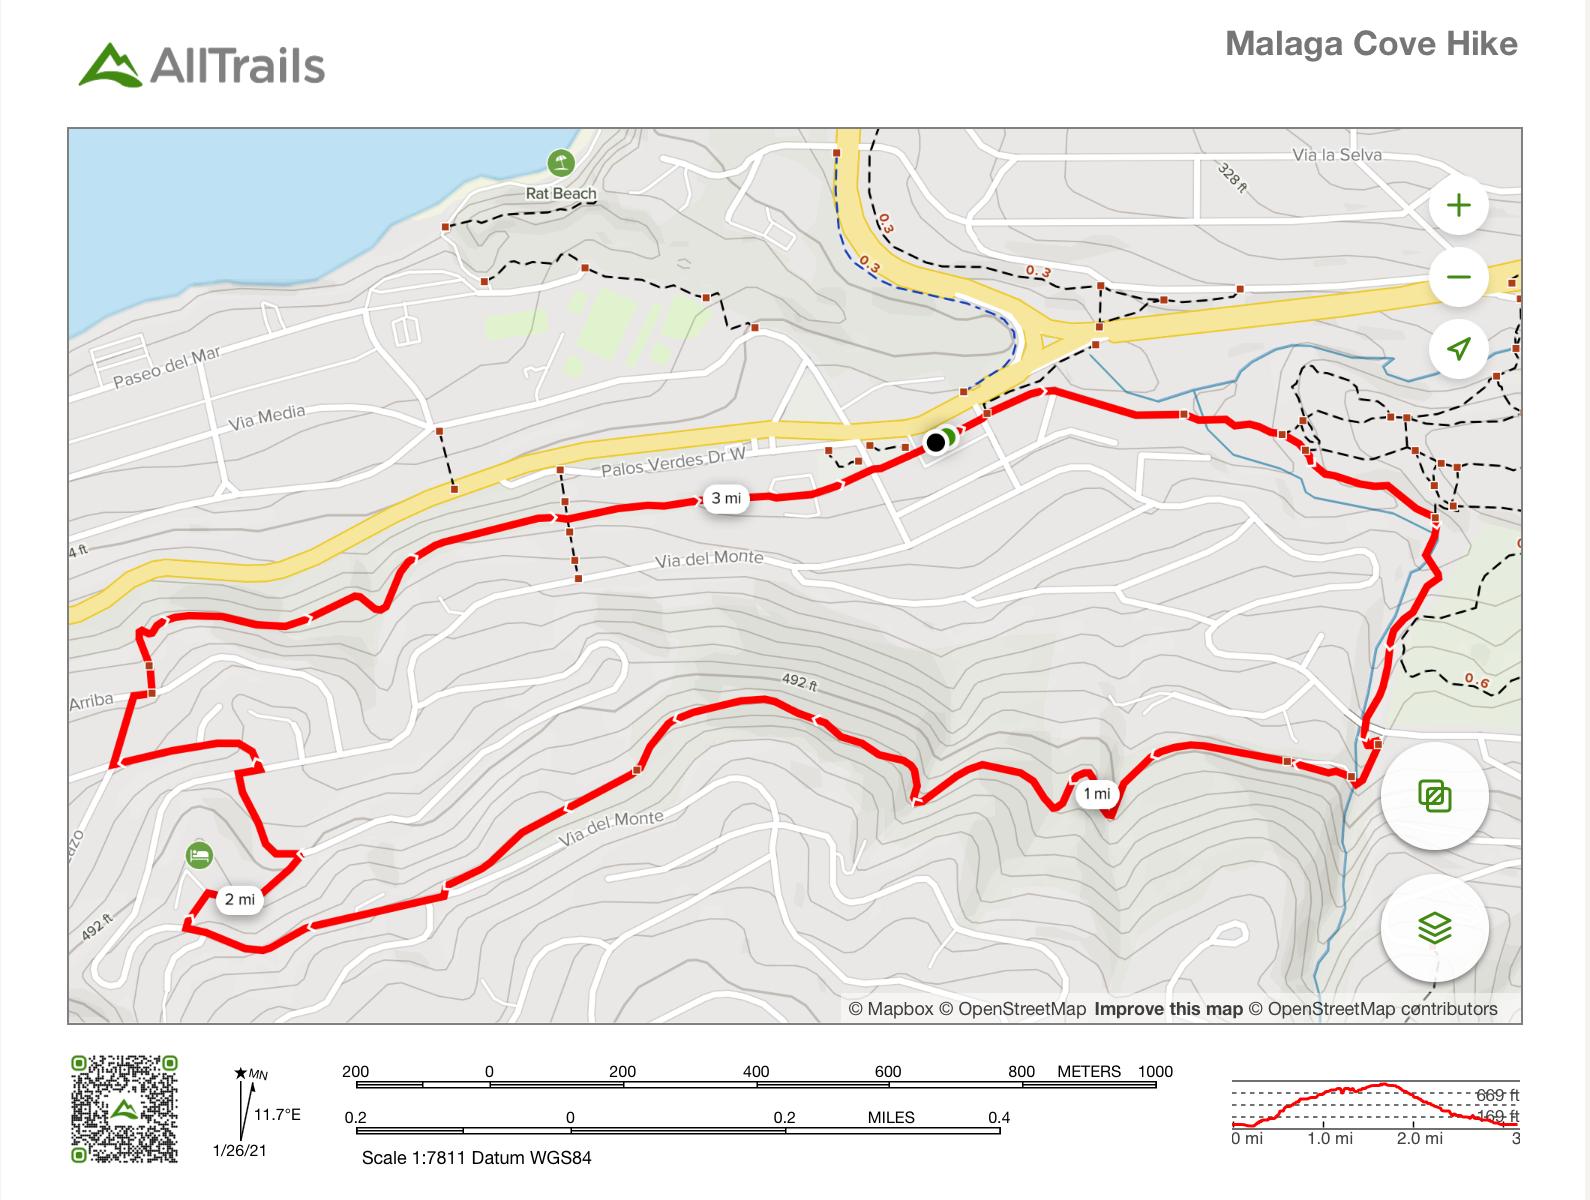 Map of Malaga Cove Hike